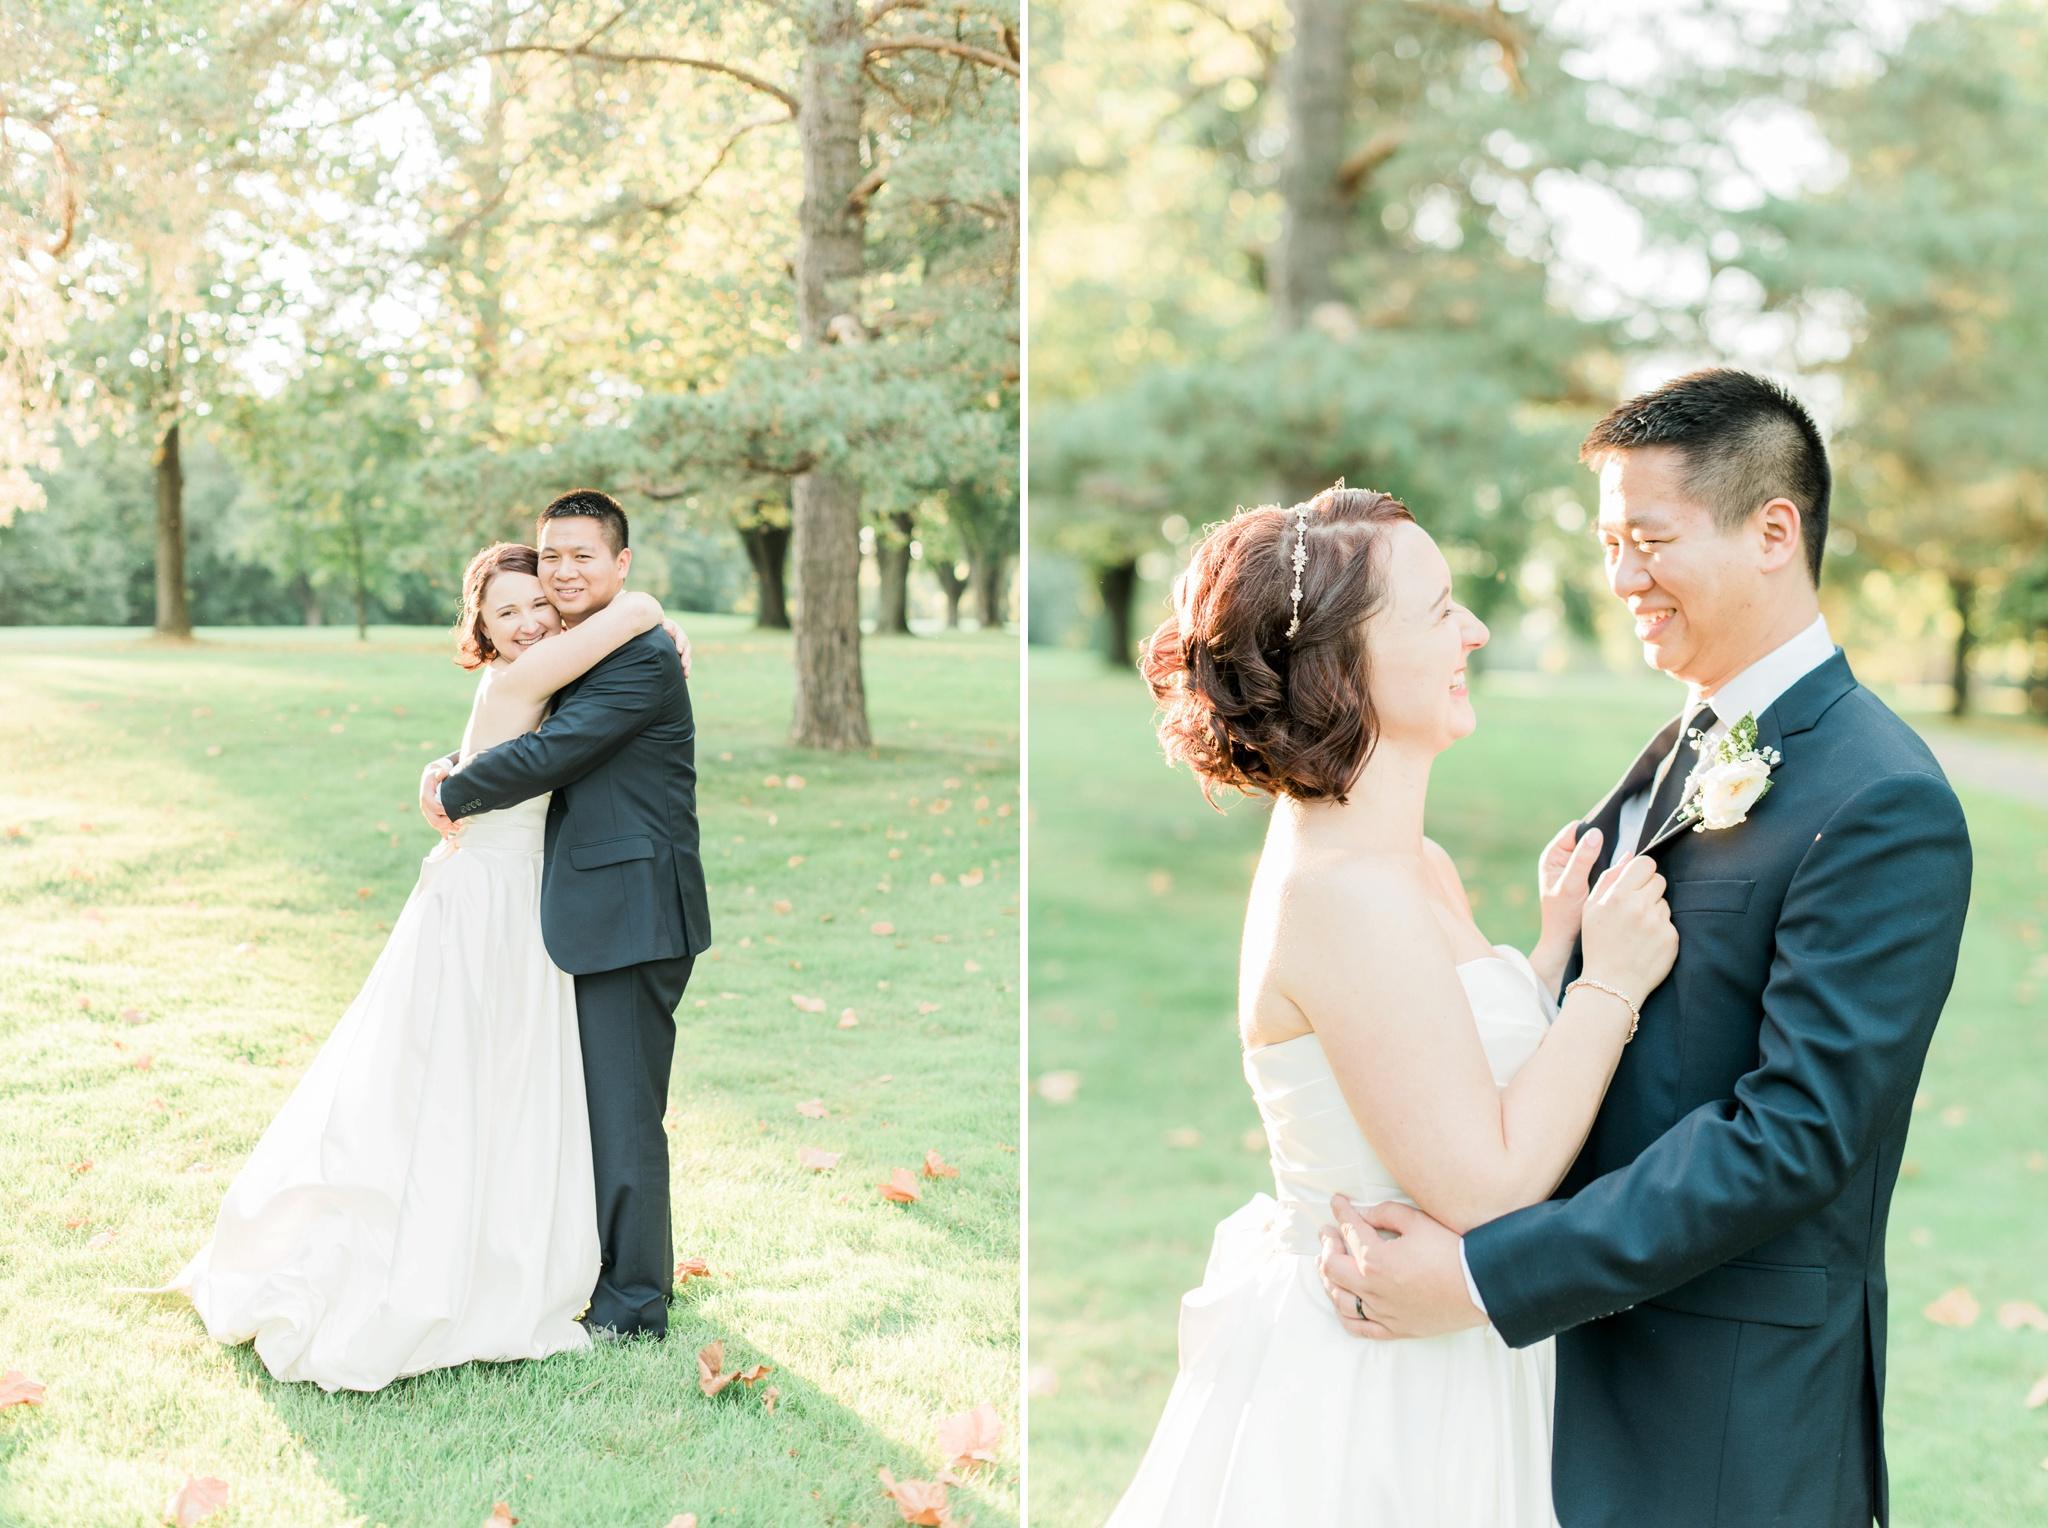 brookside-golf-country-club-wedding-columbus-ohio-124.jpg